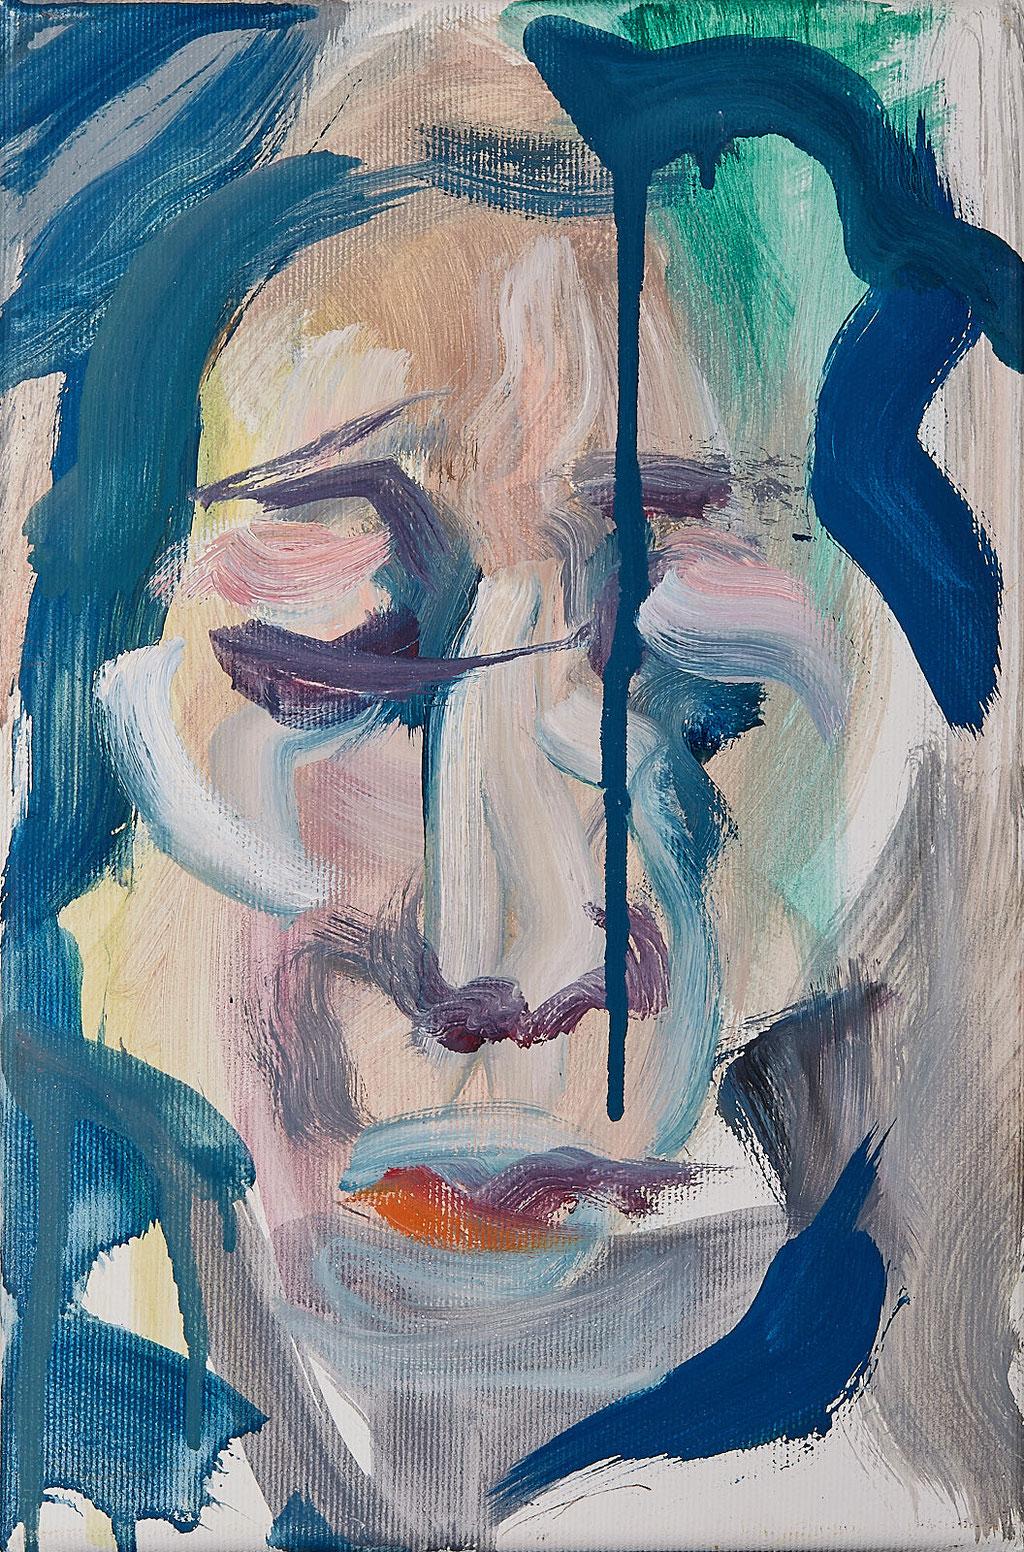 Friedrichshain - Öl - 20 x 30 cm